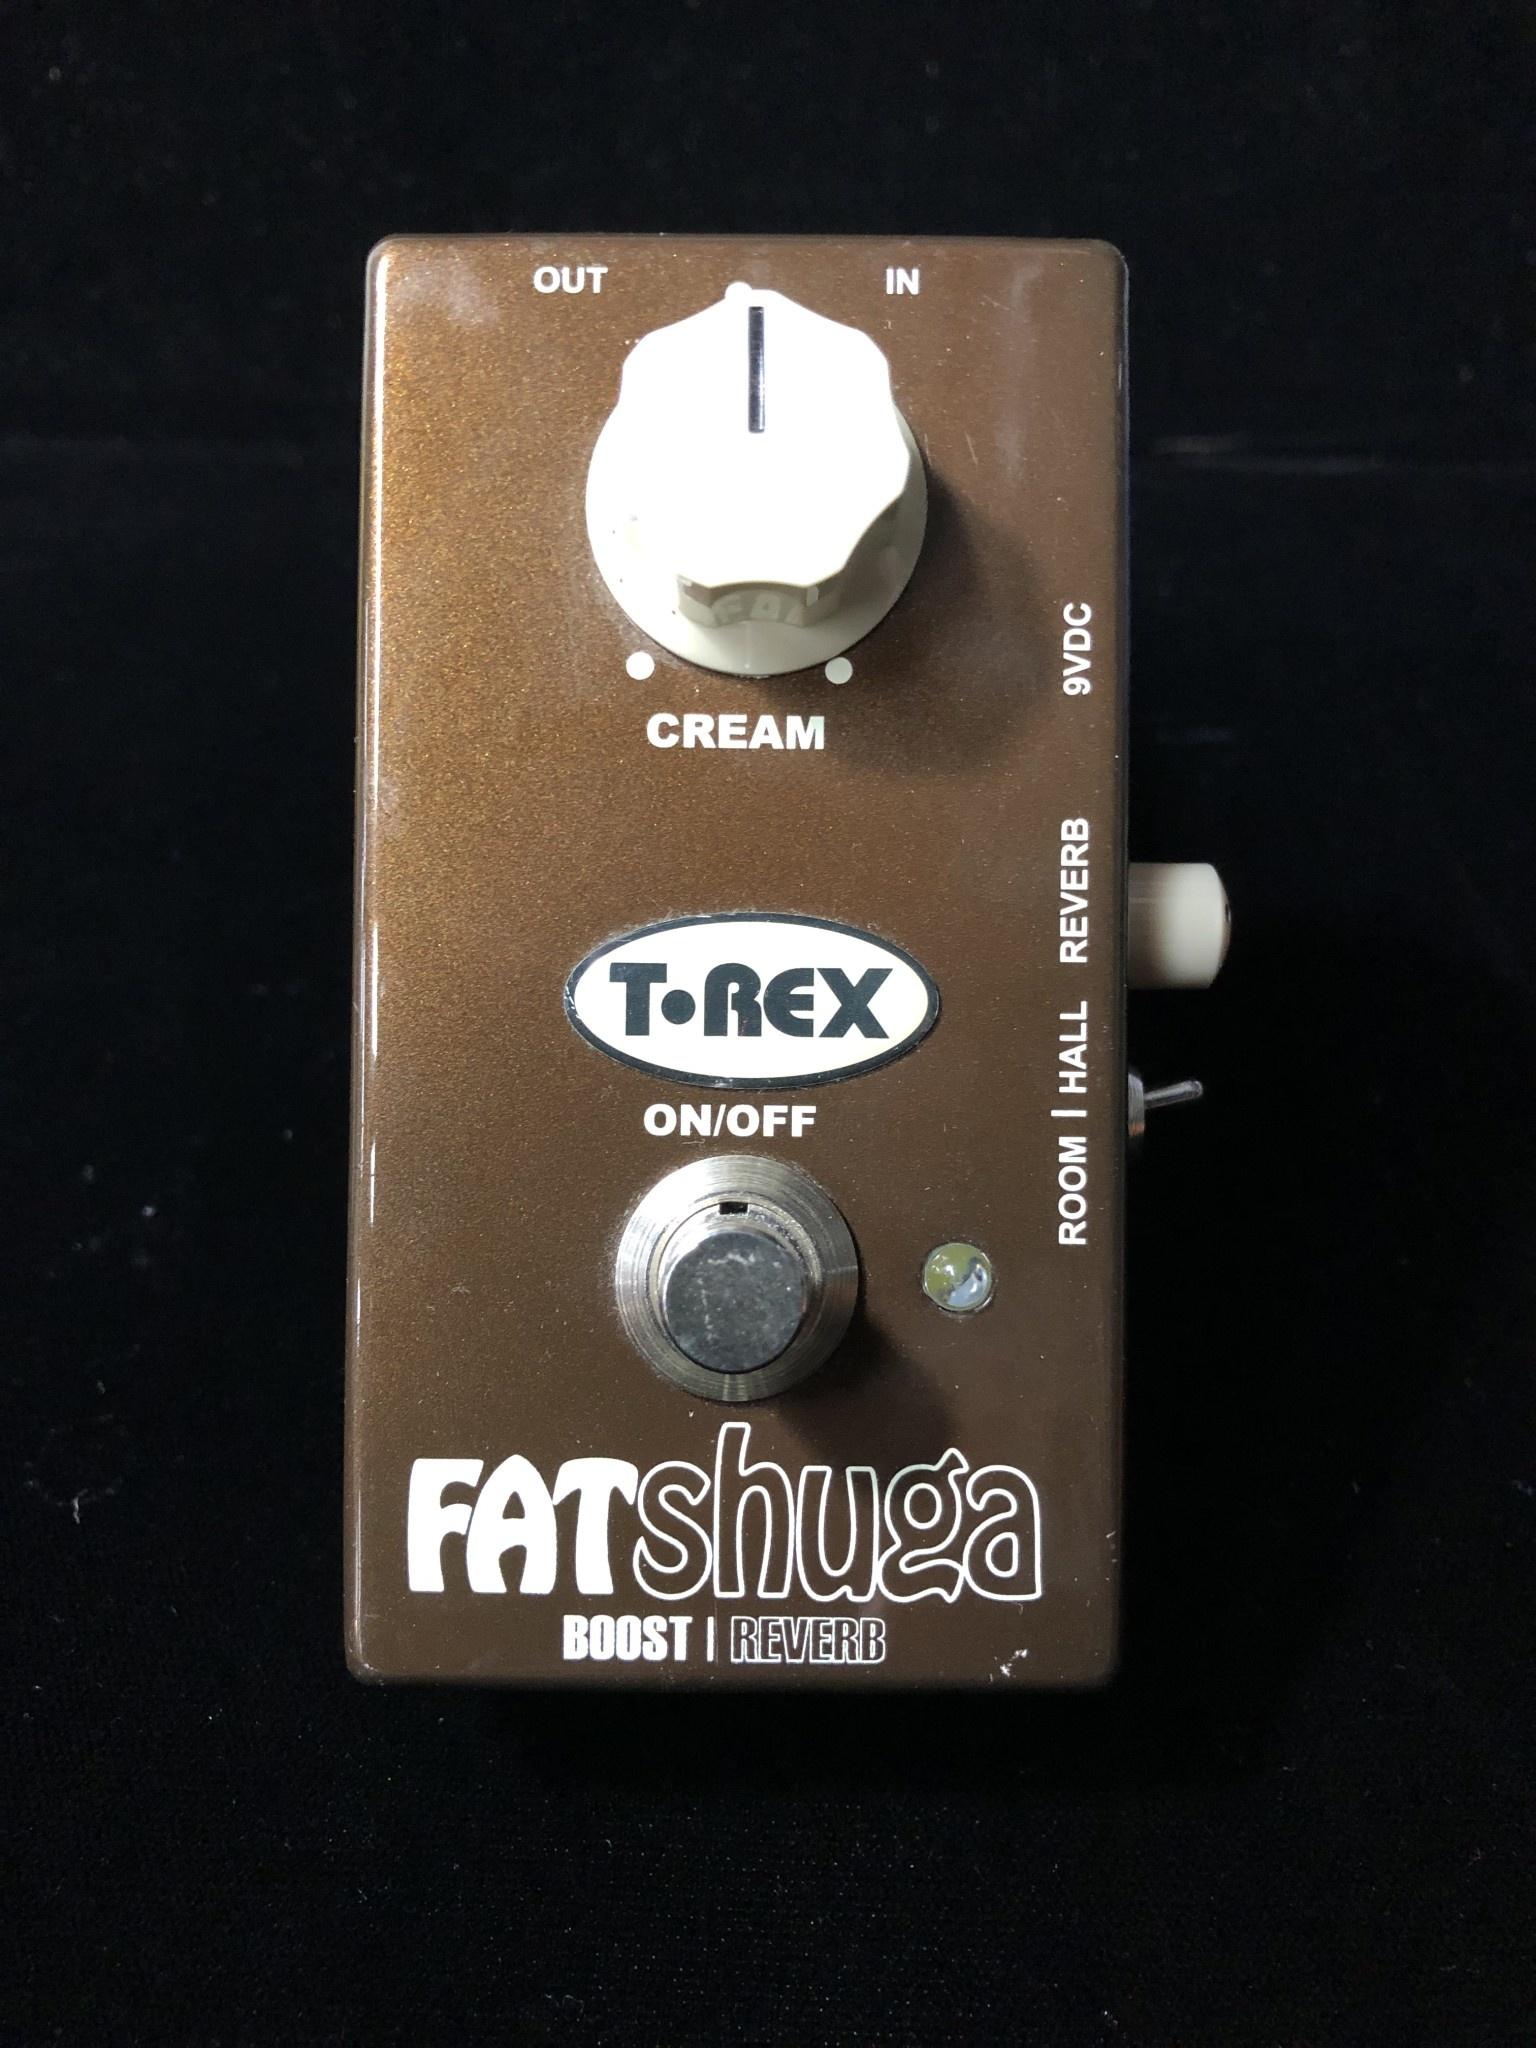 T-Rex Fat Shuga-1